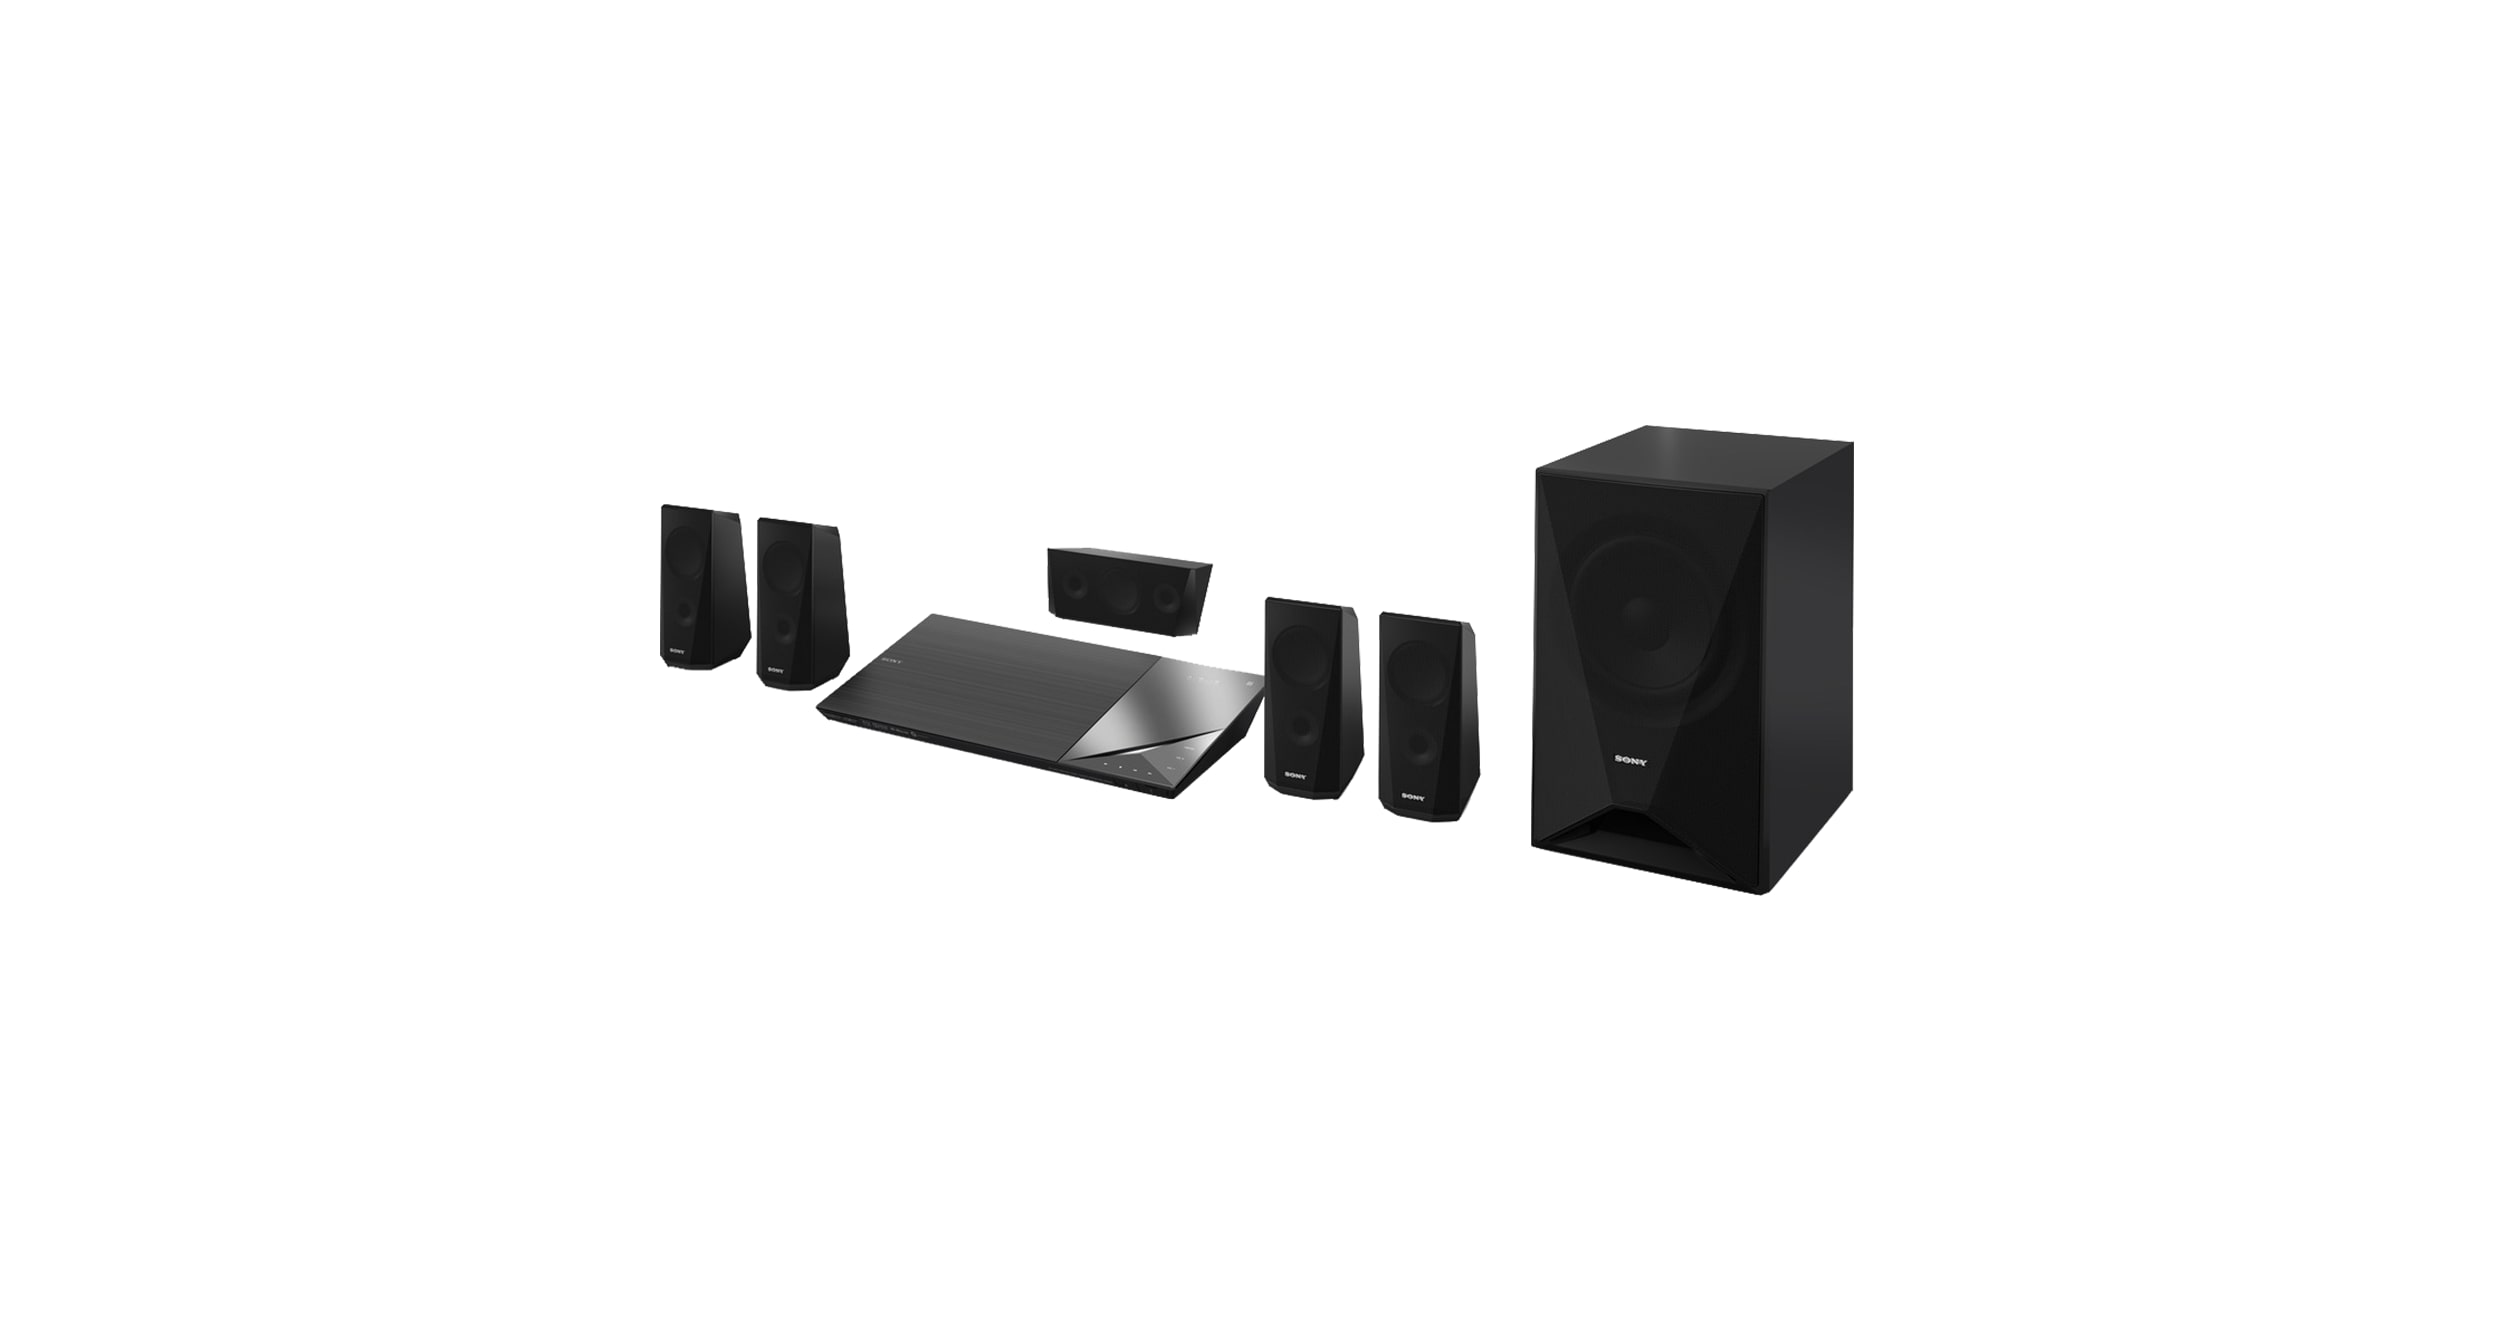 blu ray home cinema system with bluetooth bdv n5200w. Black Bedroom Furniture Sets. Home Design Ideas